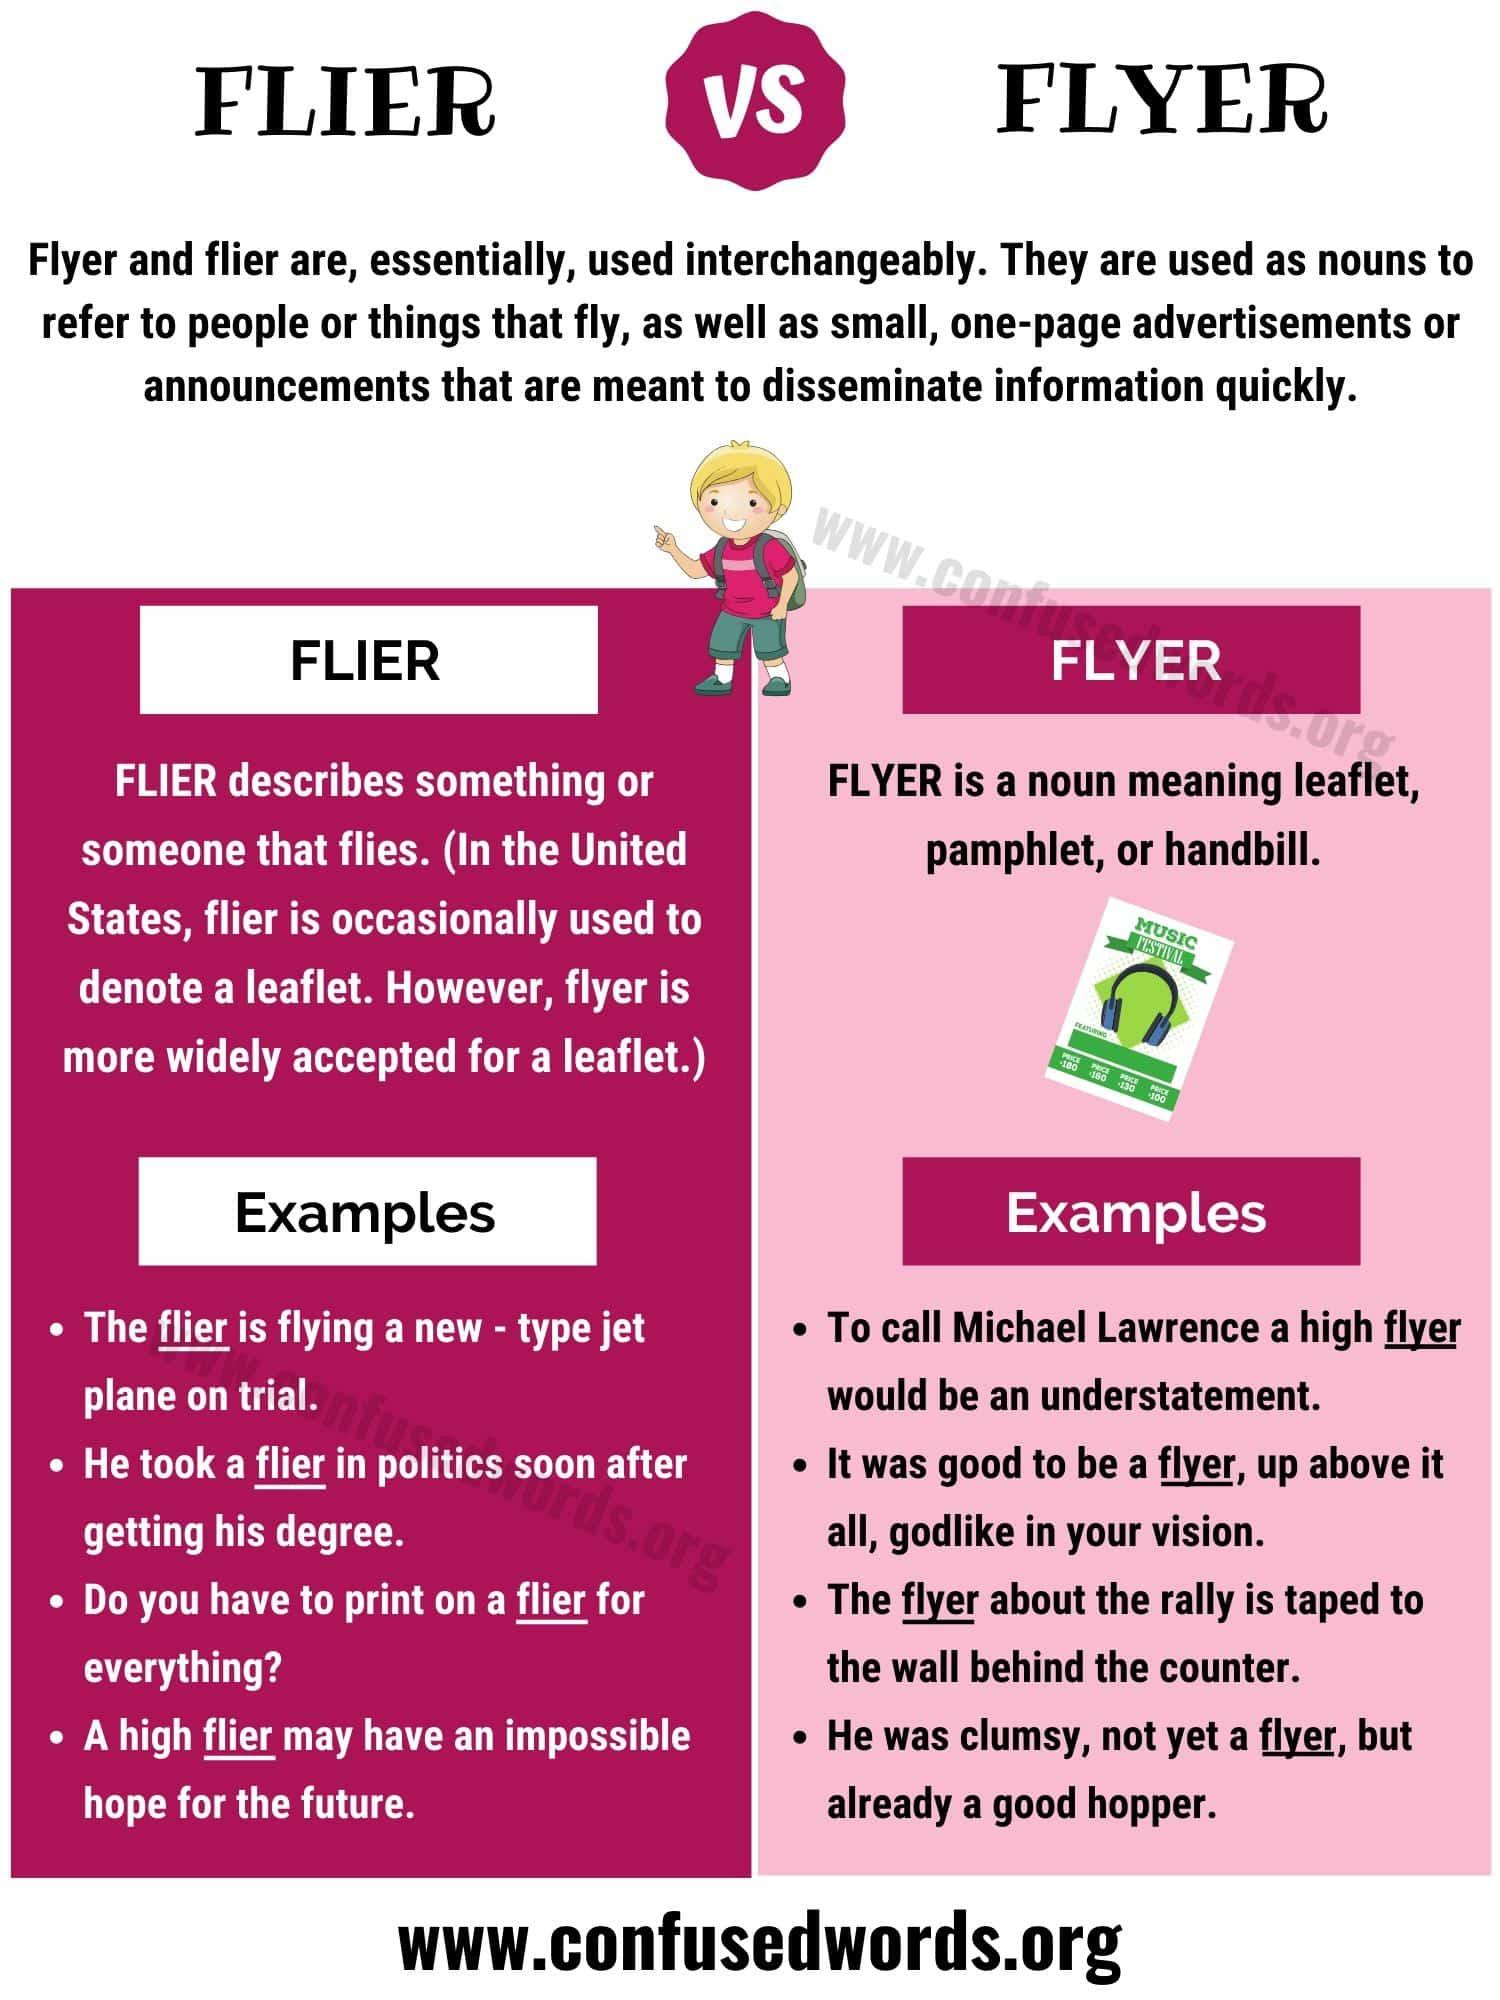 Flier vs Flyer